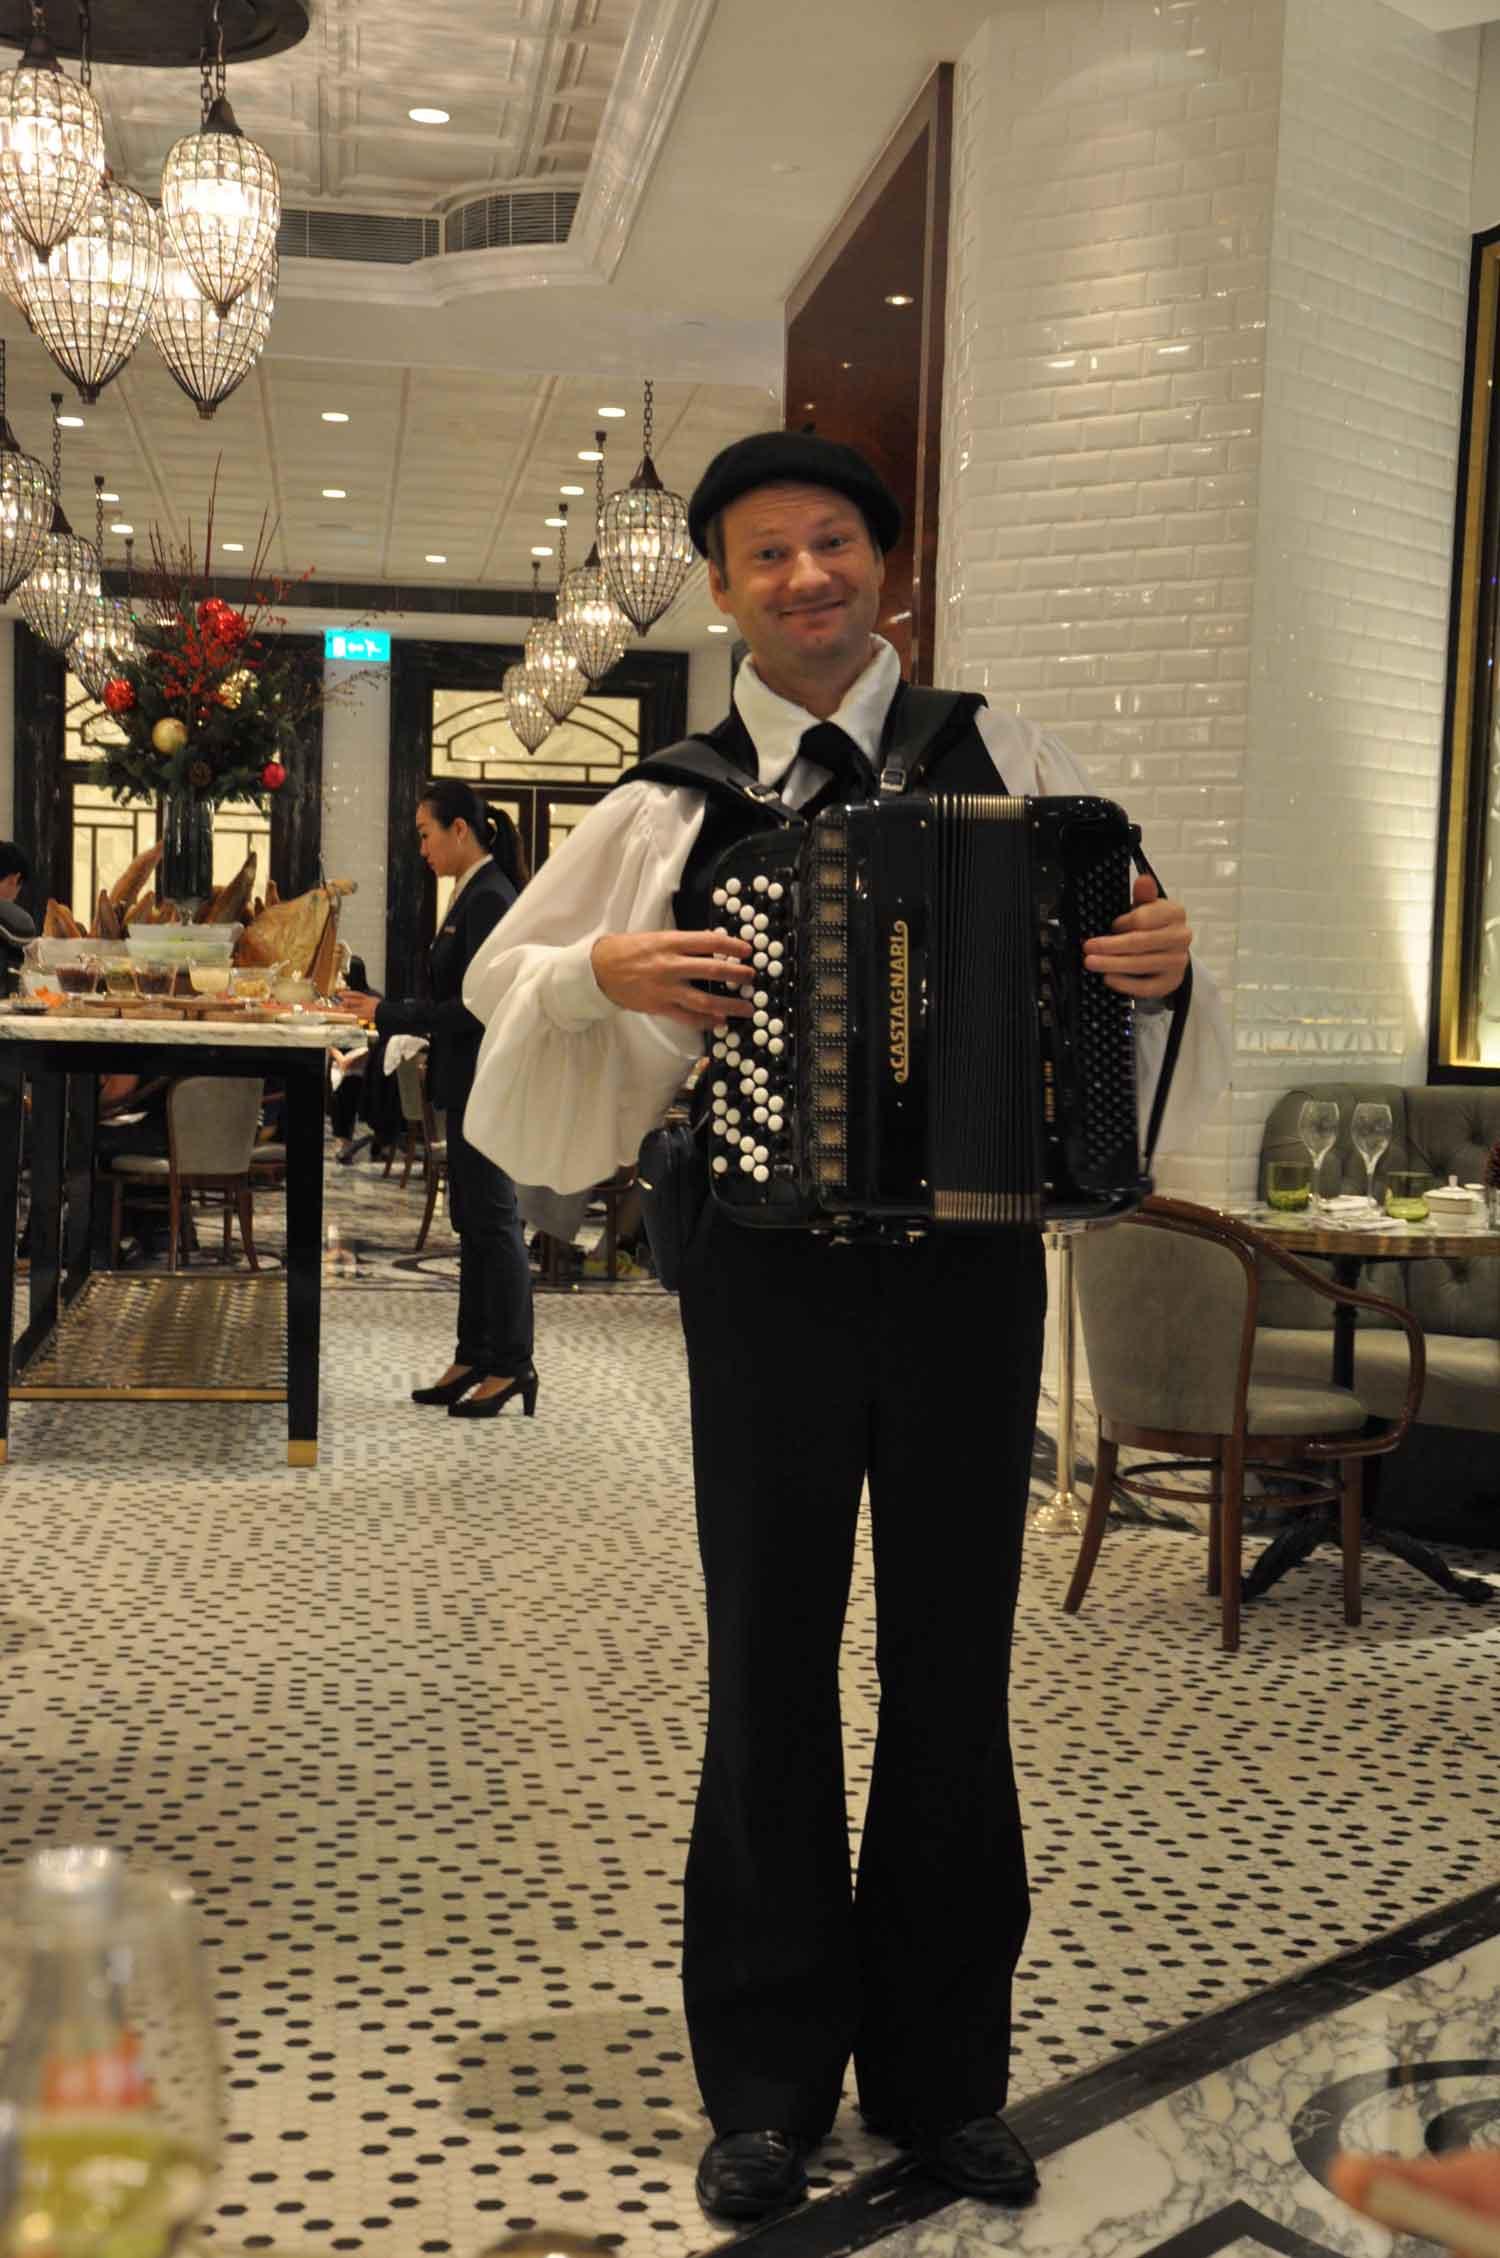 Ritz-Carlton Cafe Macau accordian player